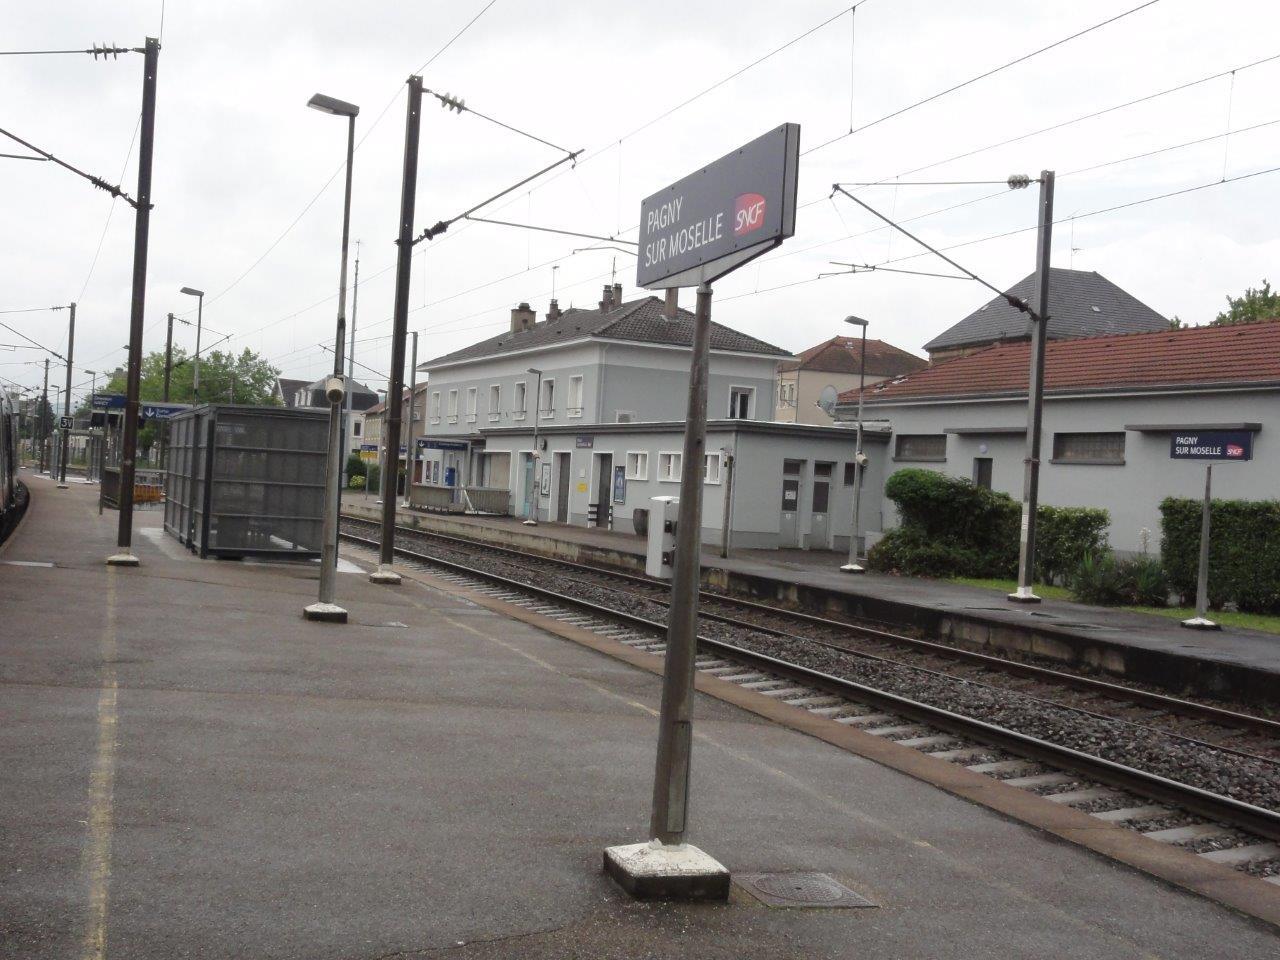 gare-de-pagny-sur-moselle-train-station